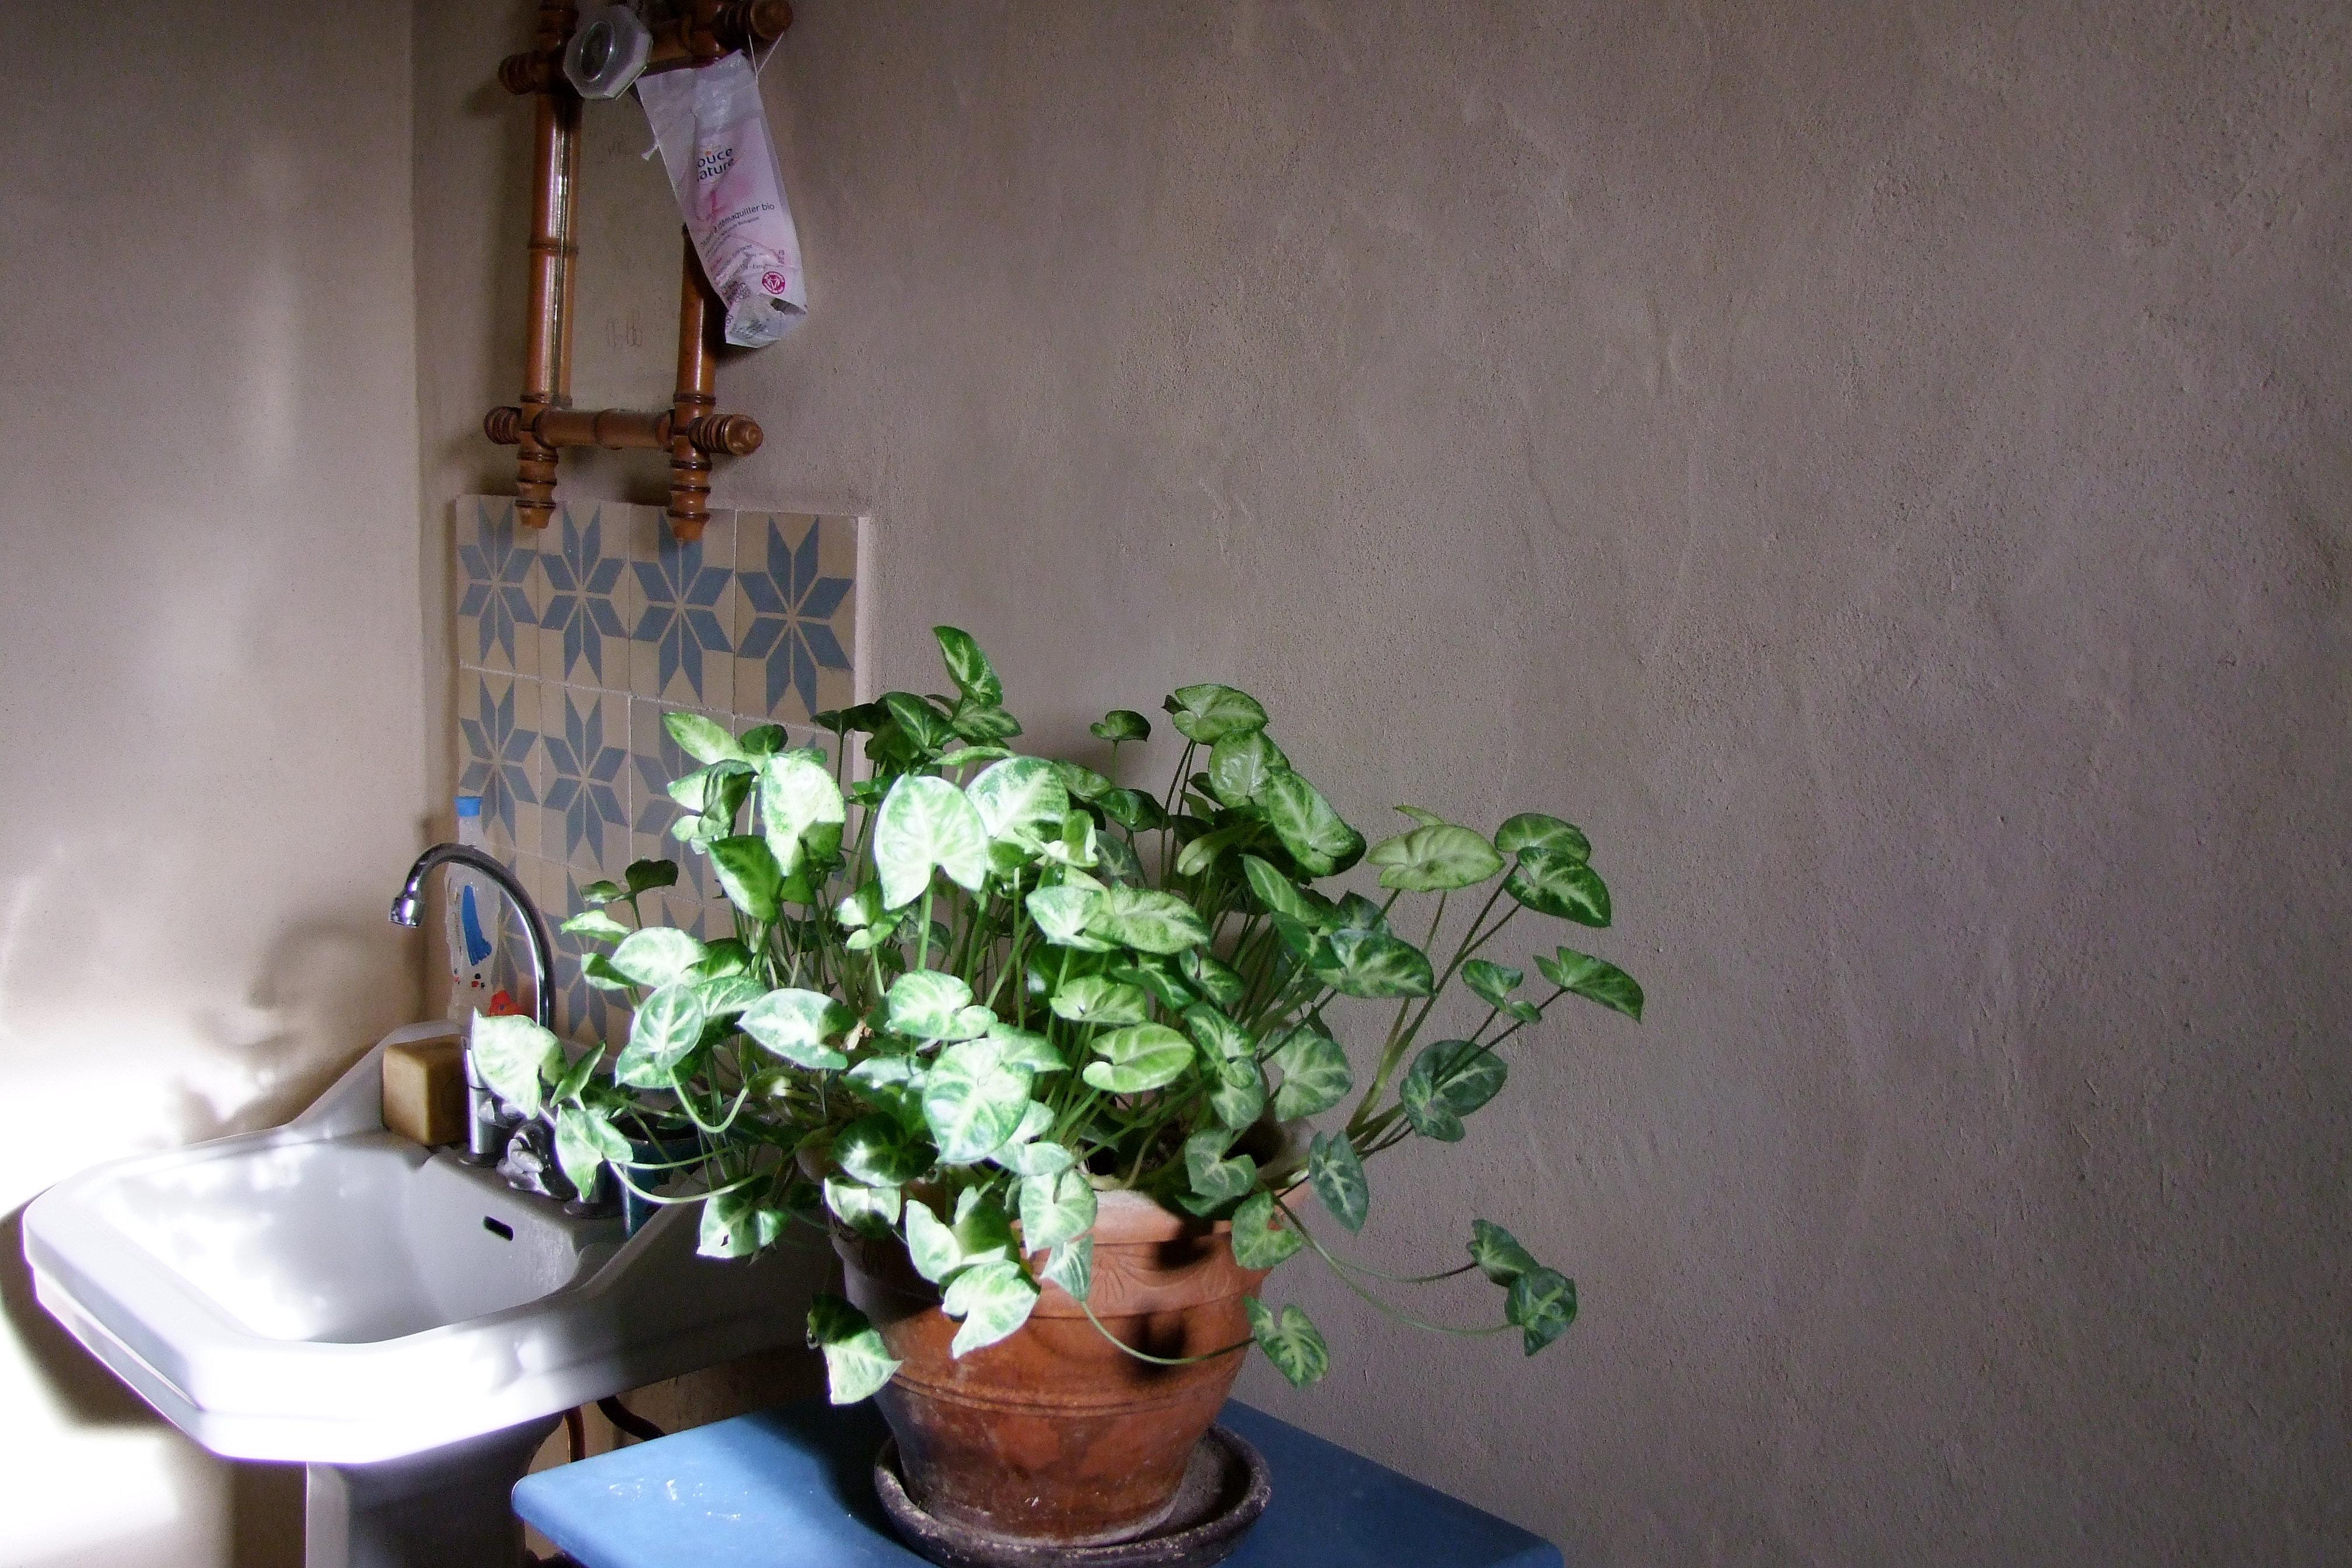 La peintre bio vanessa burgui re - Paillette de lin ...